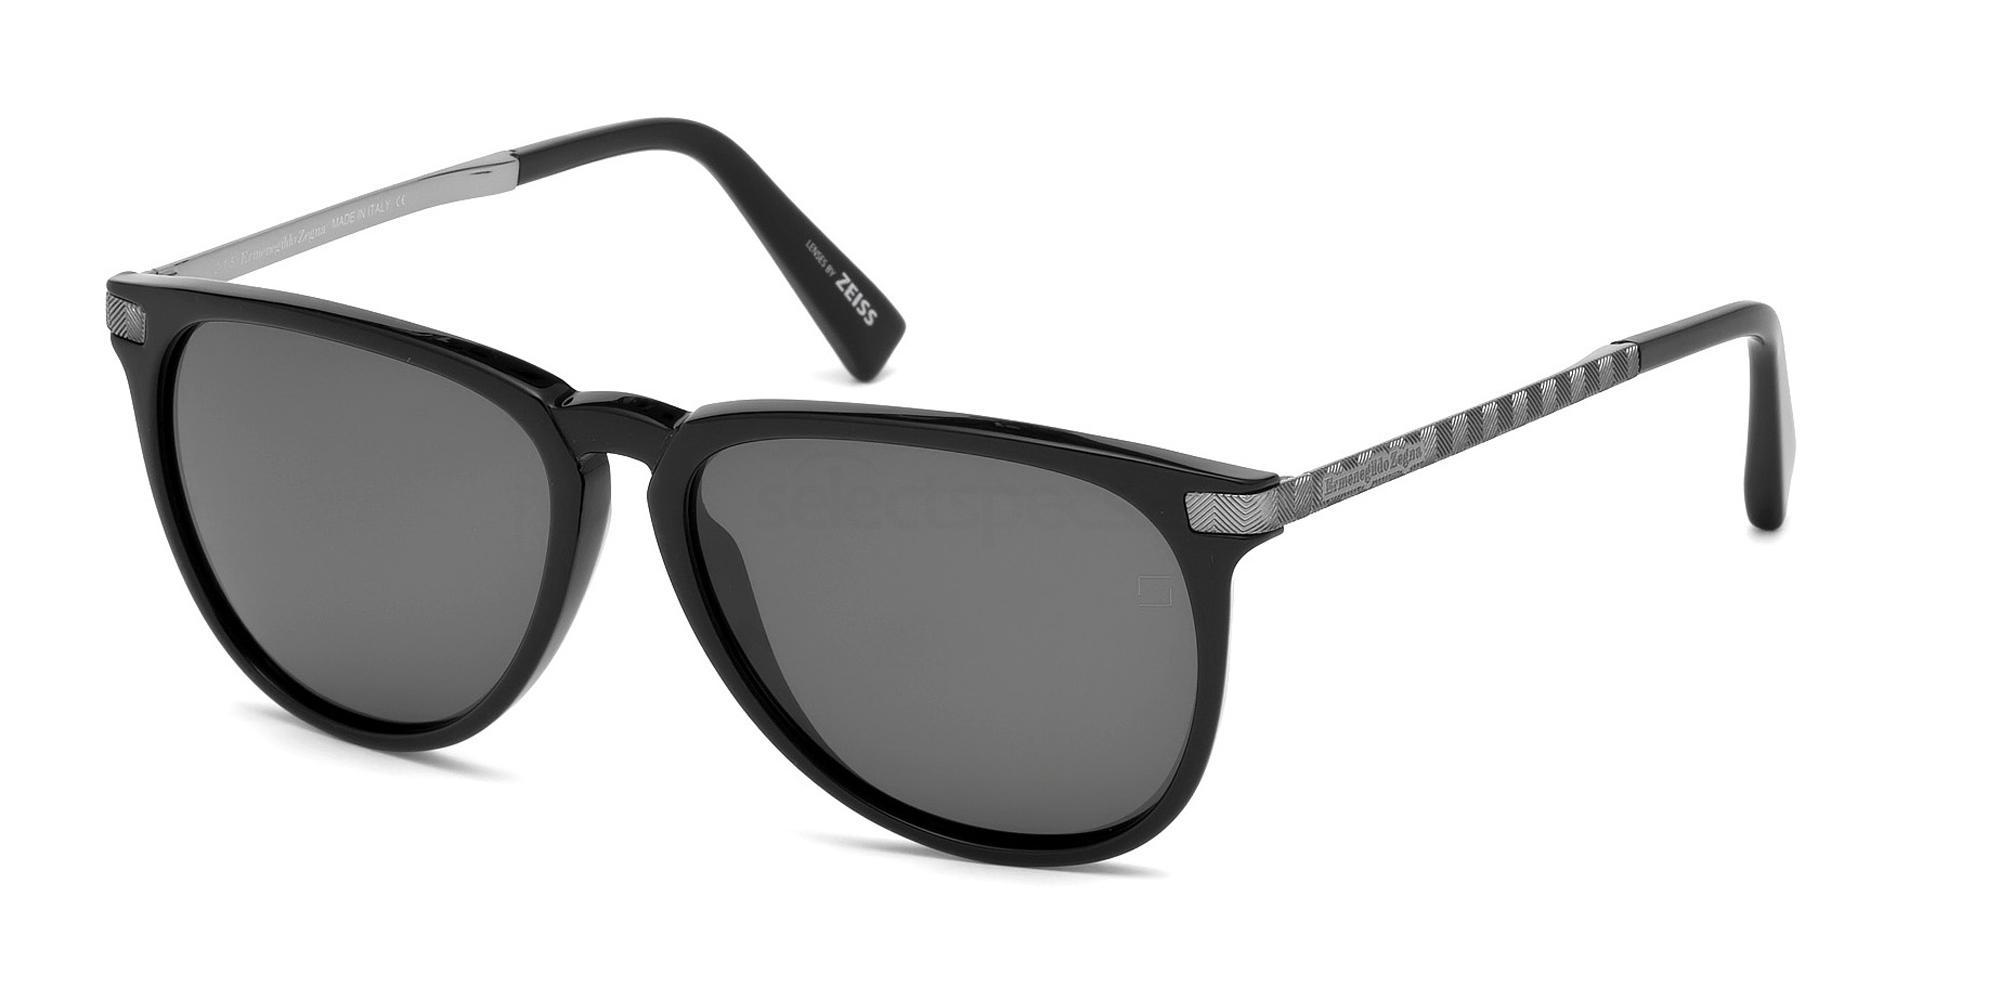 01D EZ0038 Sunglasses, Ermenegildo Zegna